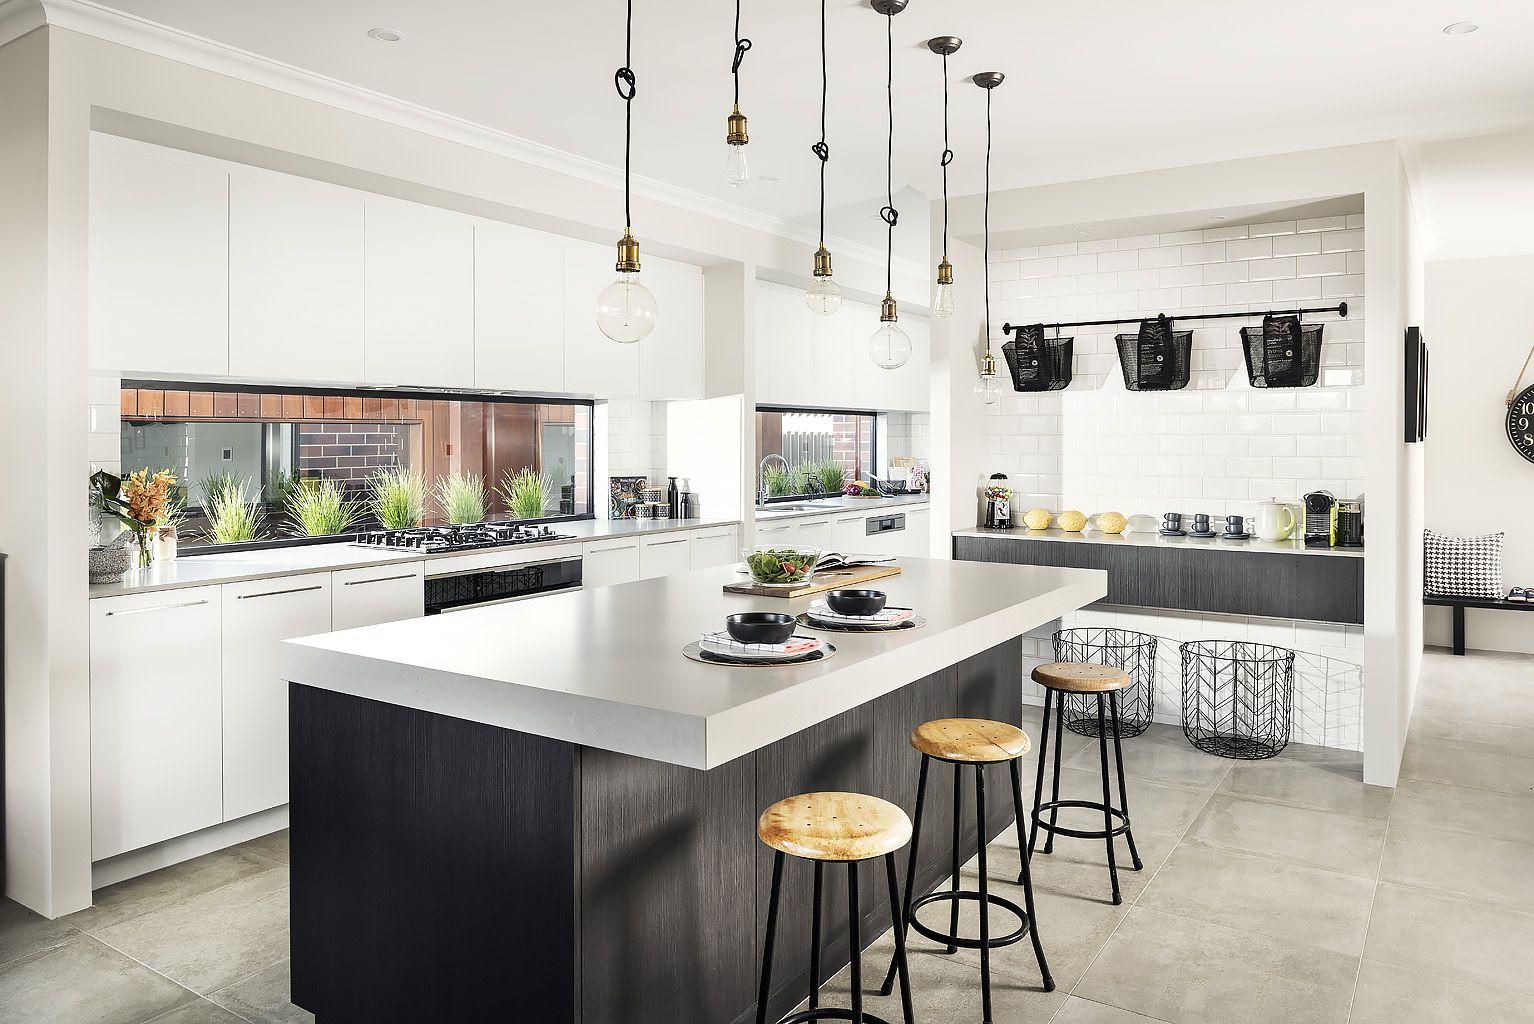 Pin On Kitchen Design Kitchen styles for 2016